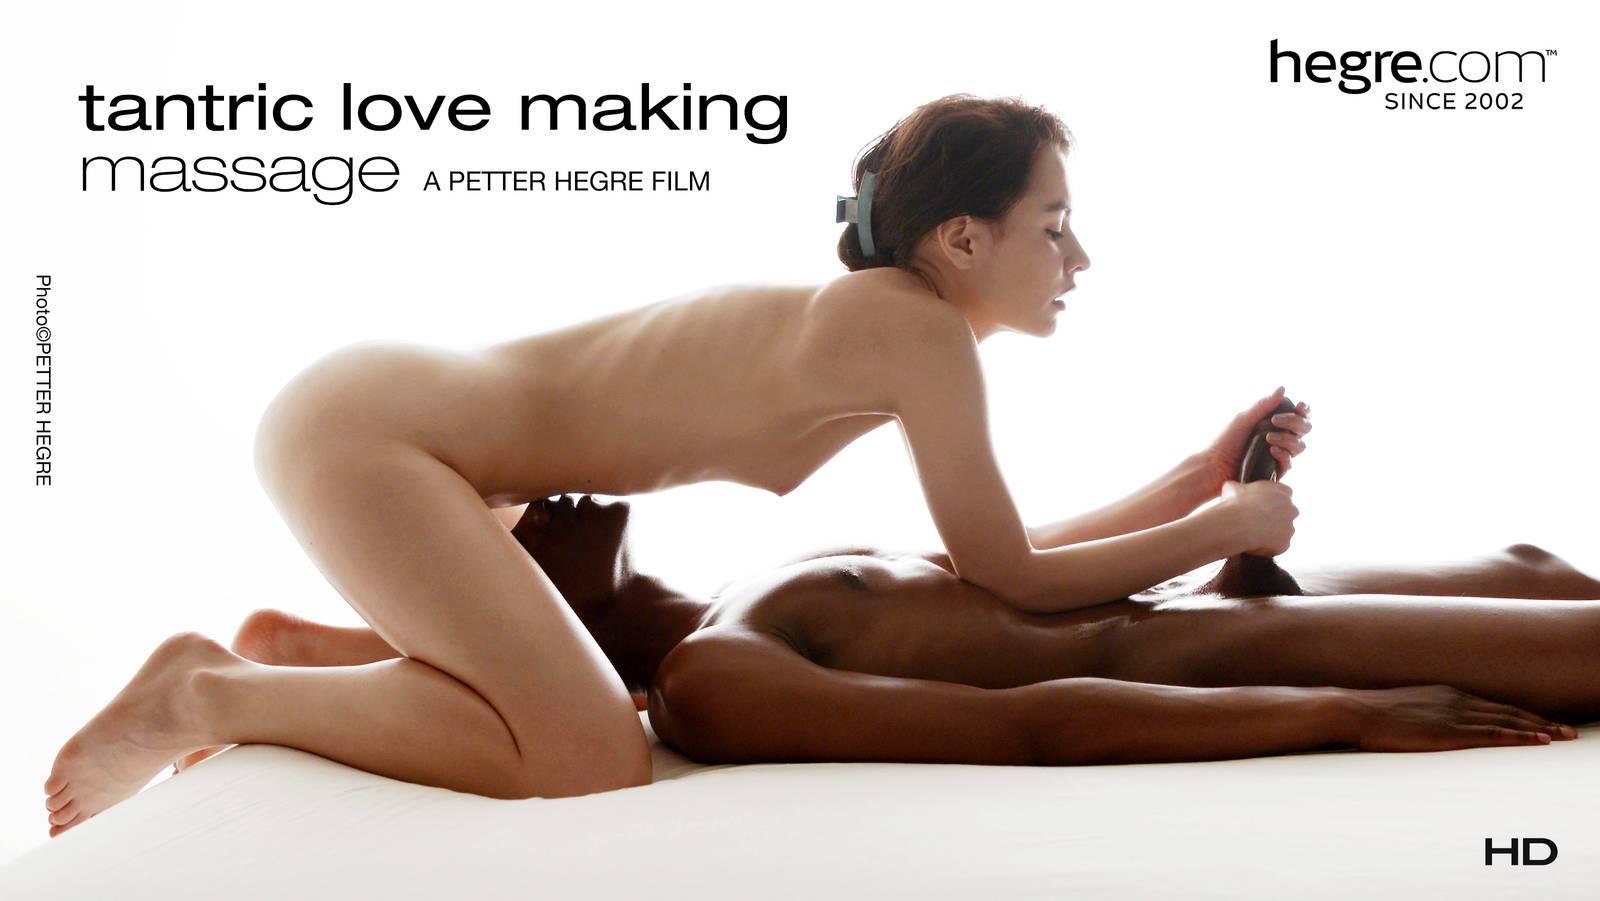 Tantric love making massage hegre